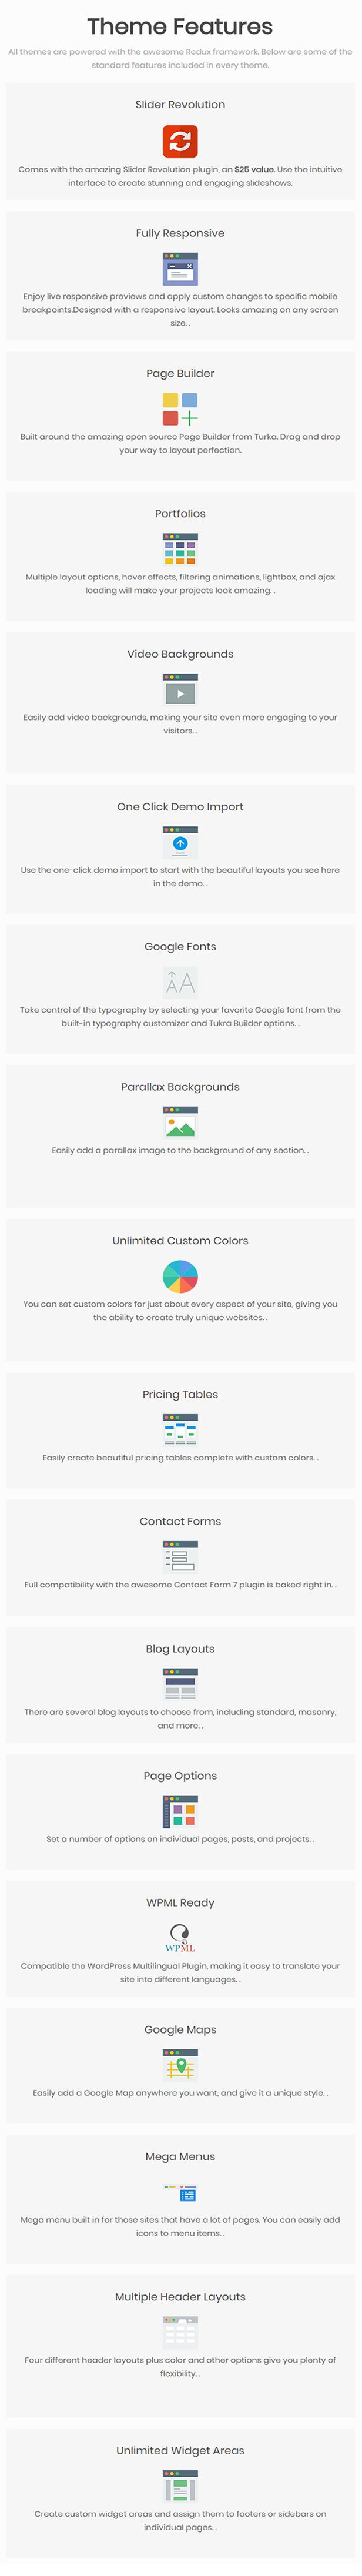 Turka - Multi-Purpose WordPress Theme - 2